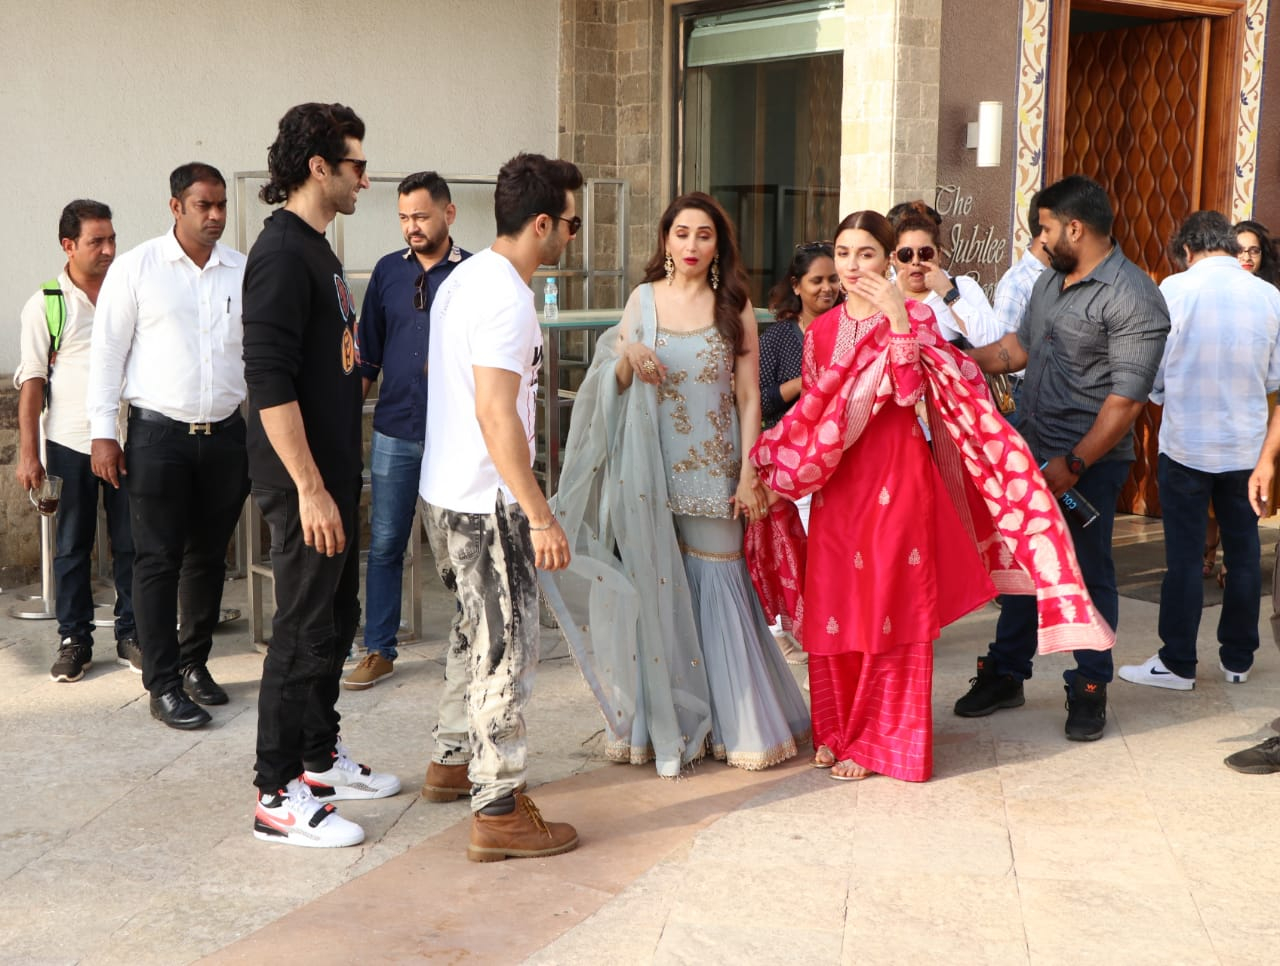 Kalank Varun Dhawan Alia bhatt ADitya Roy Kapoor Walk